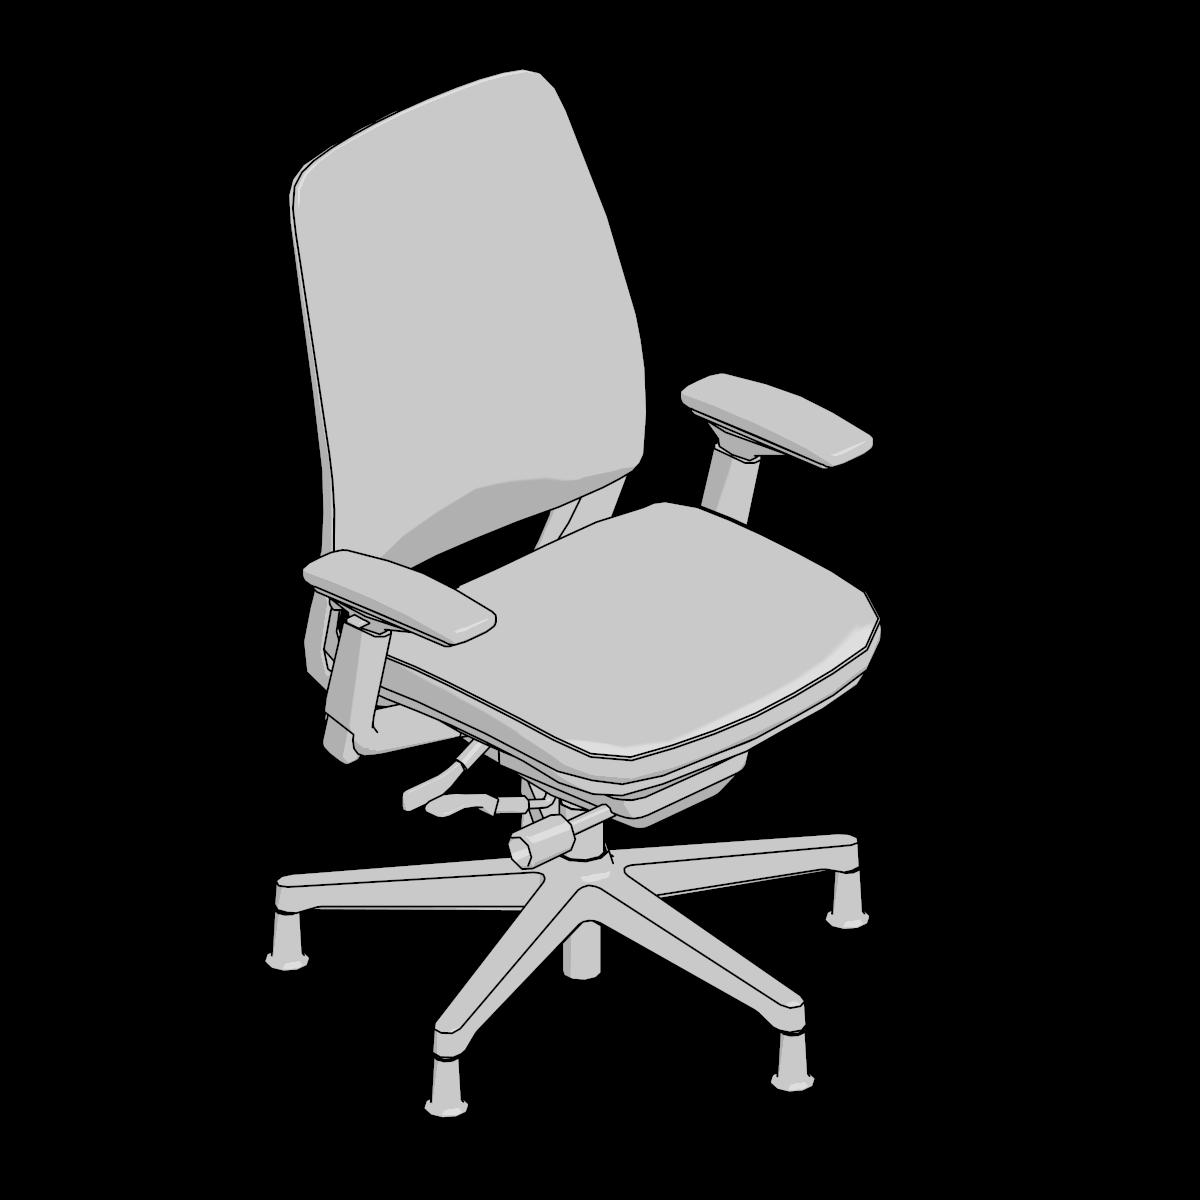 Auto CAD 43D Furniture Model Downloads - Steelcase